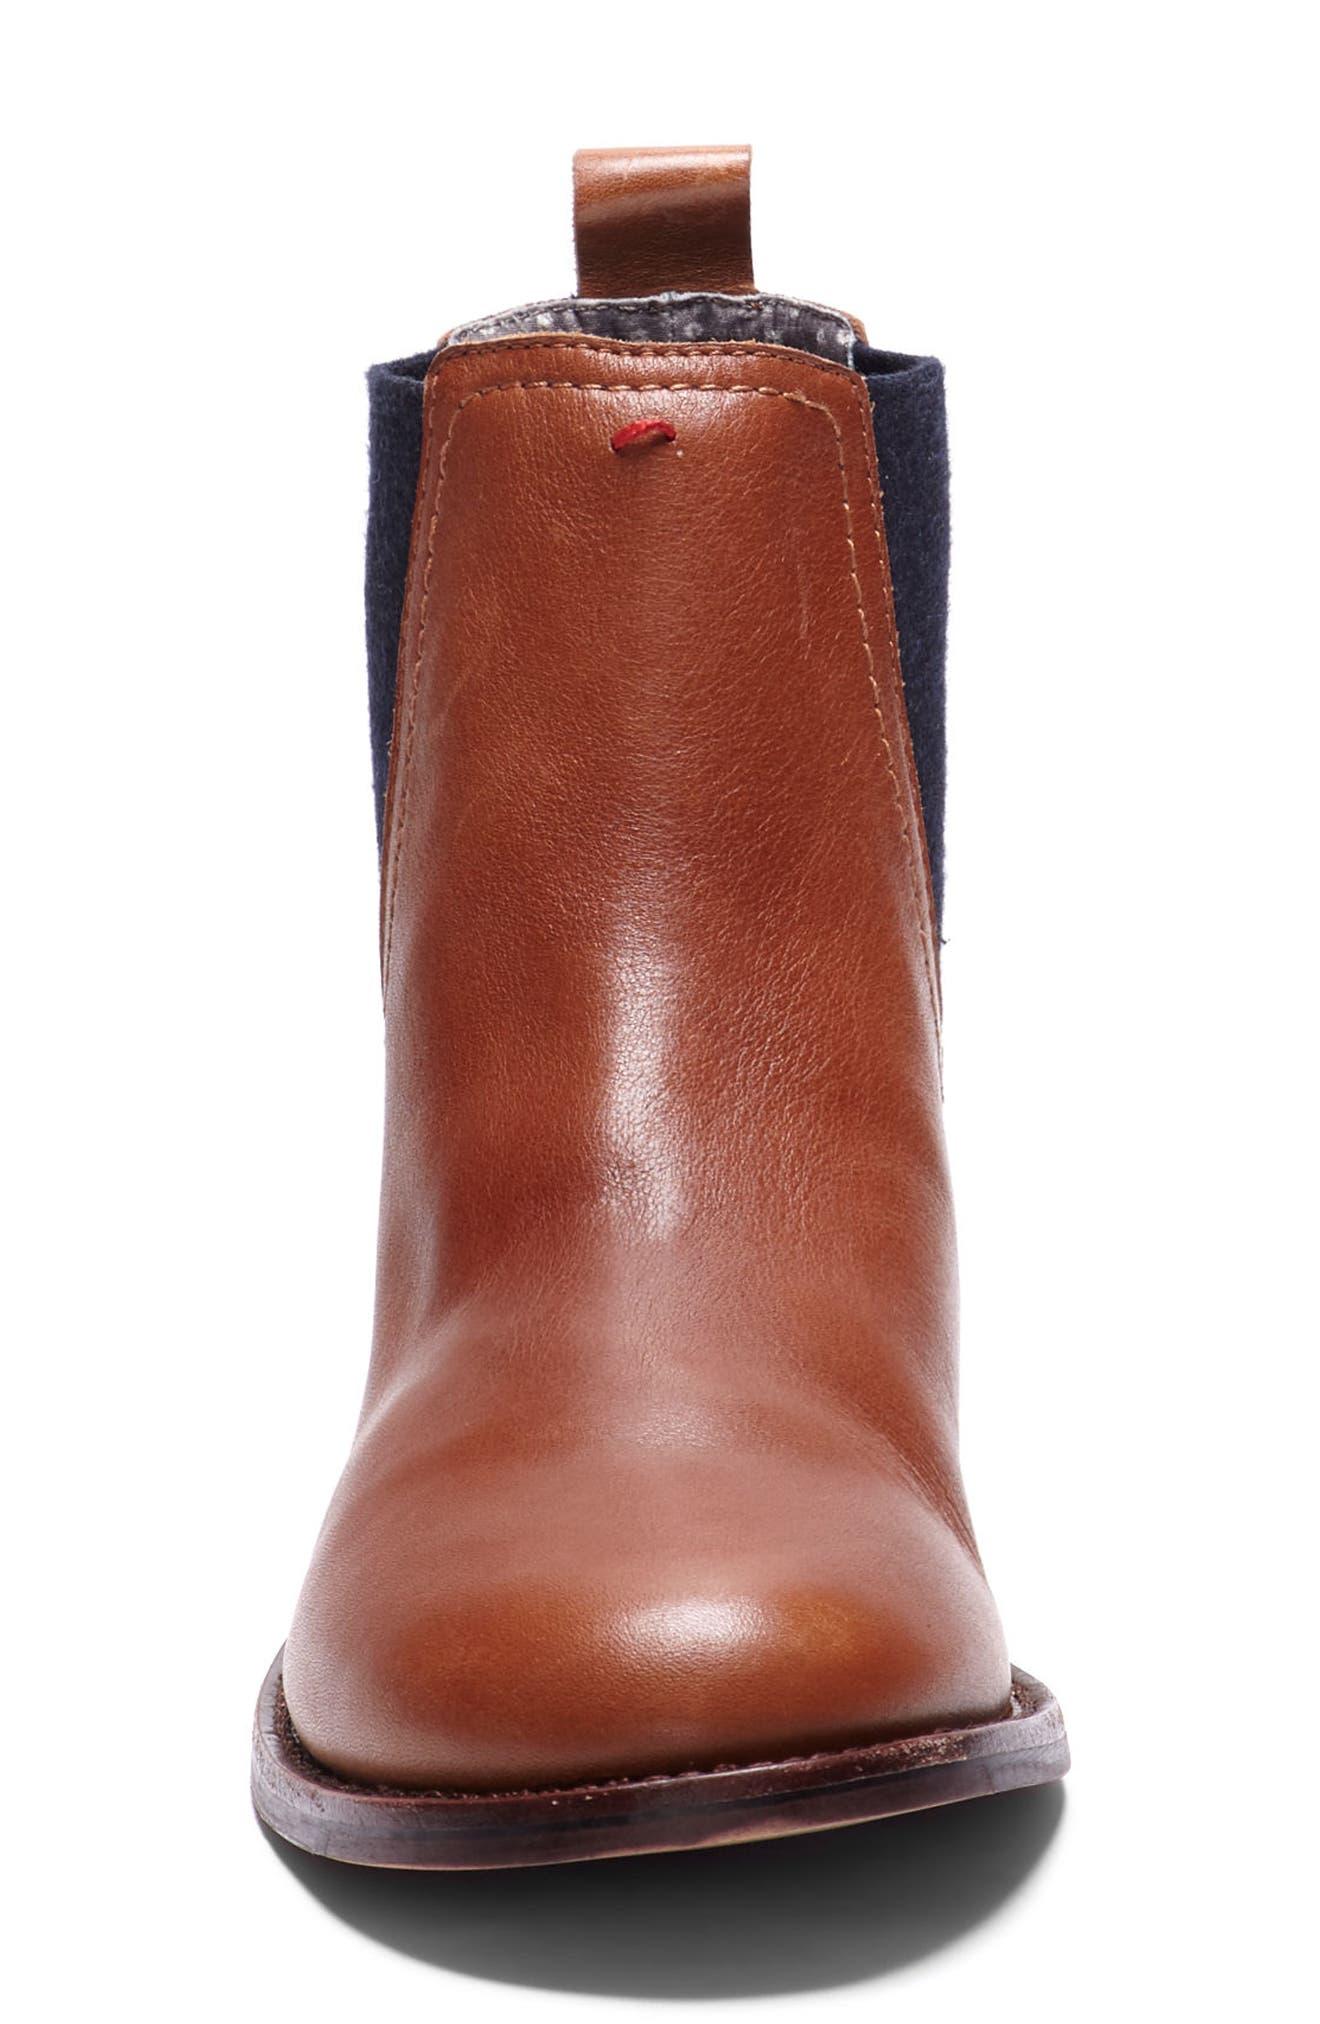 Zabi Chelsea Boot,                             Alternate thumbnail 3, color,                             241